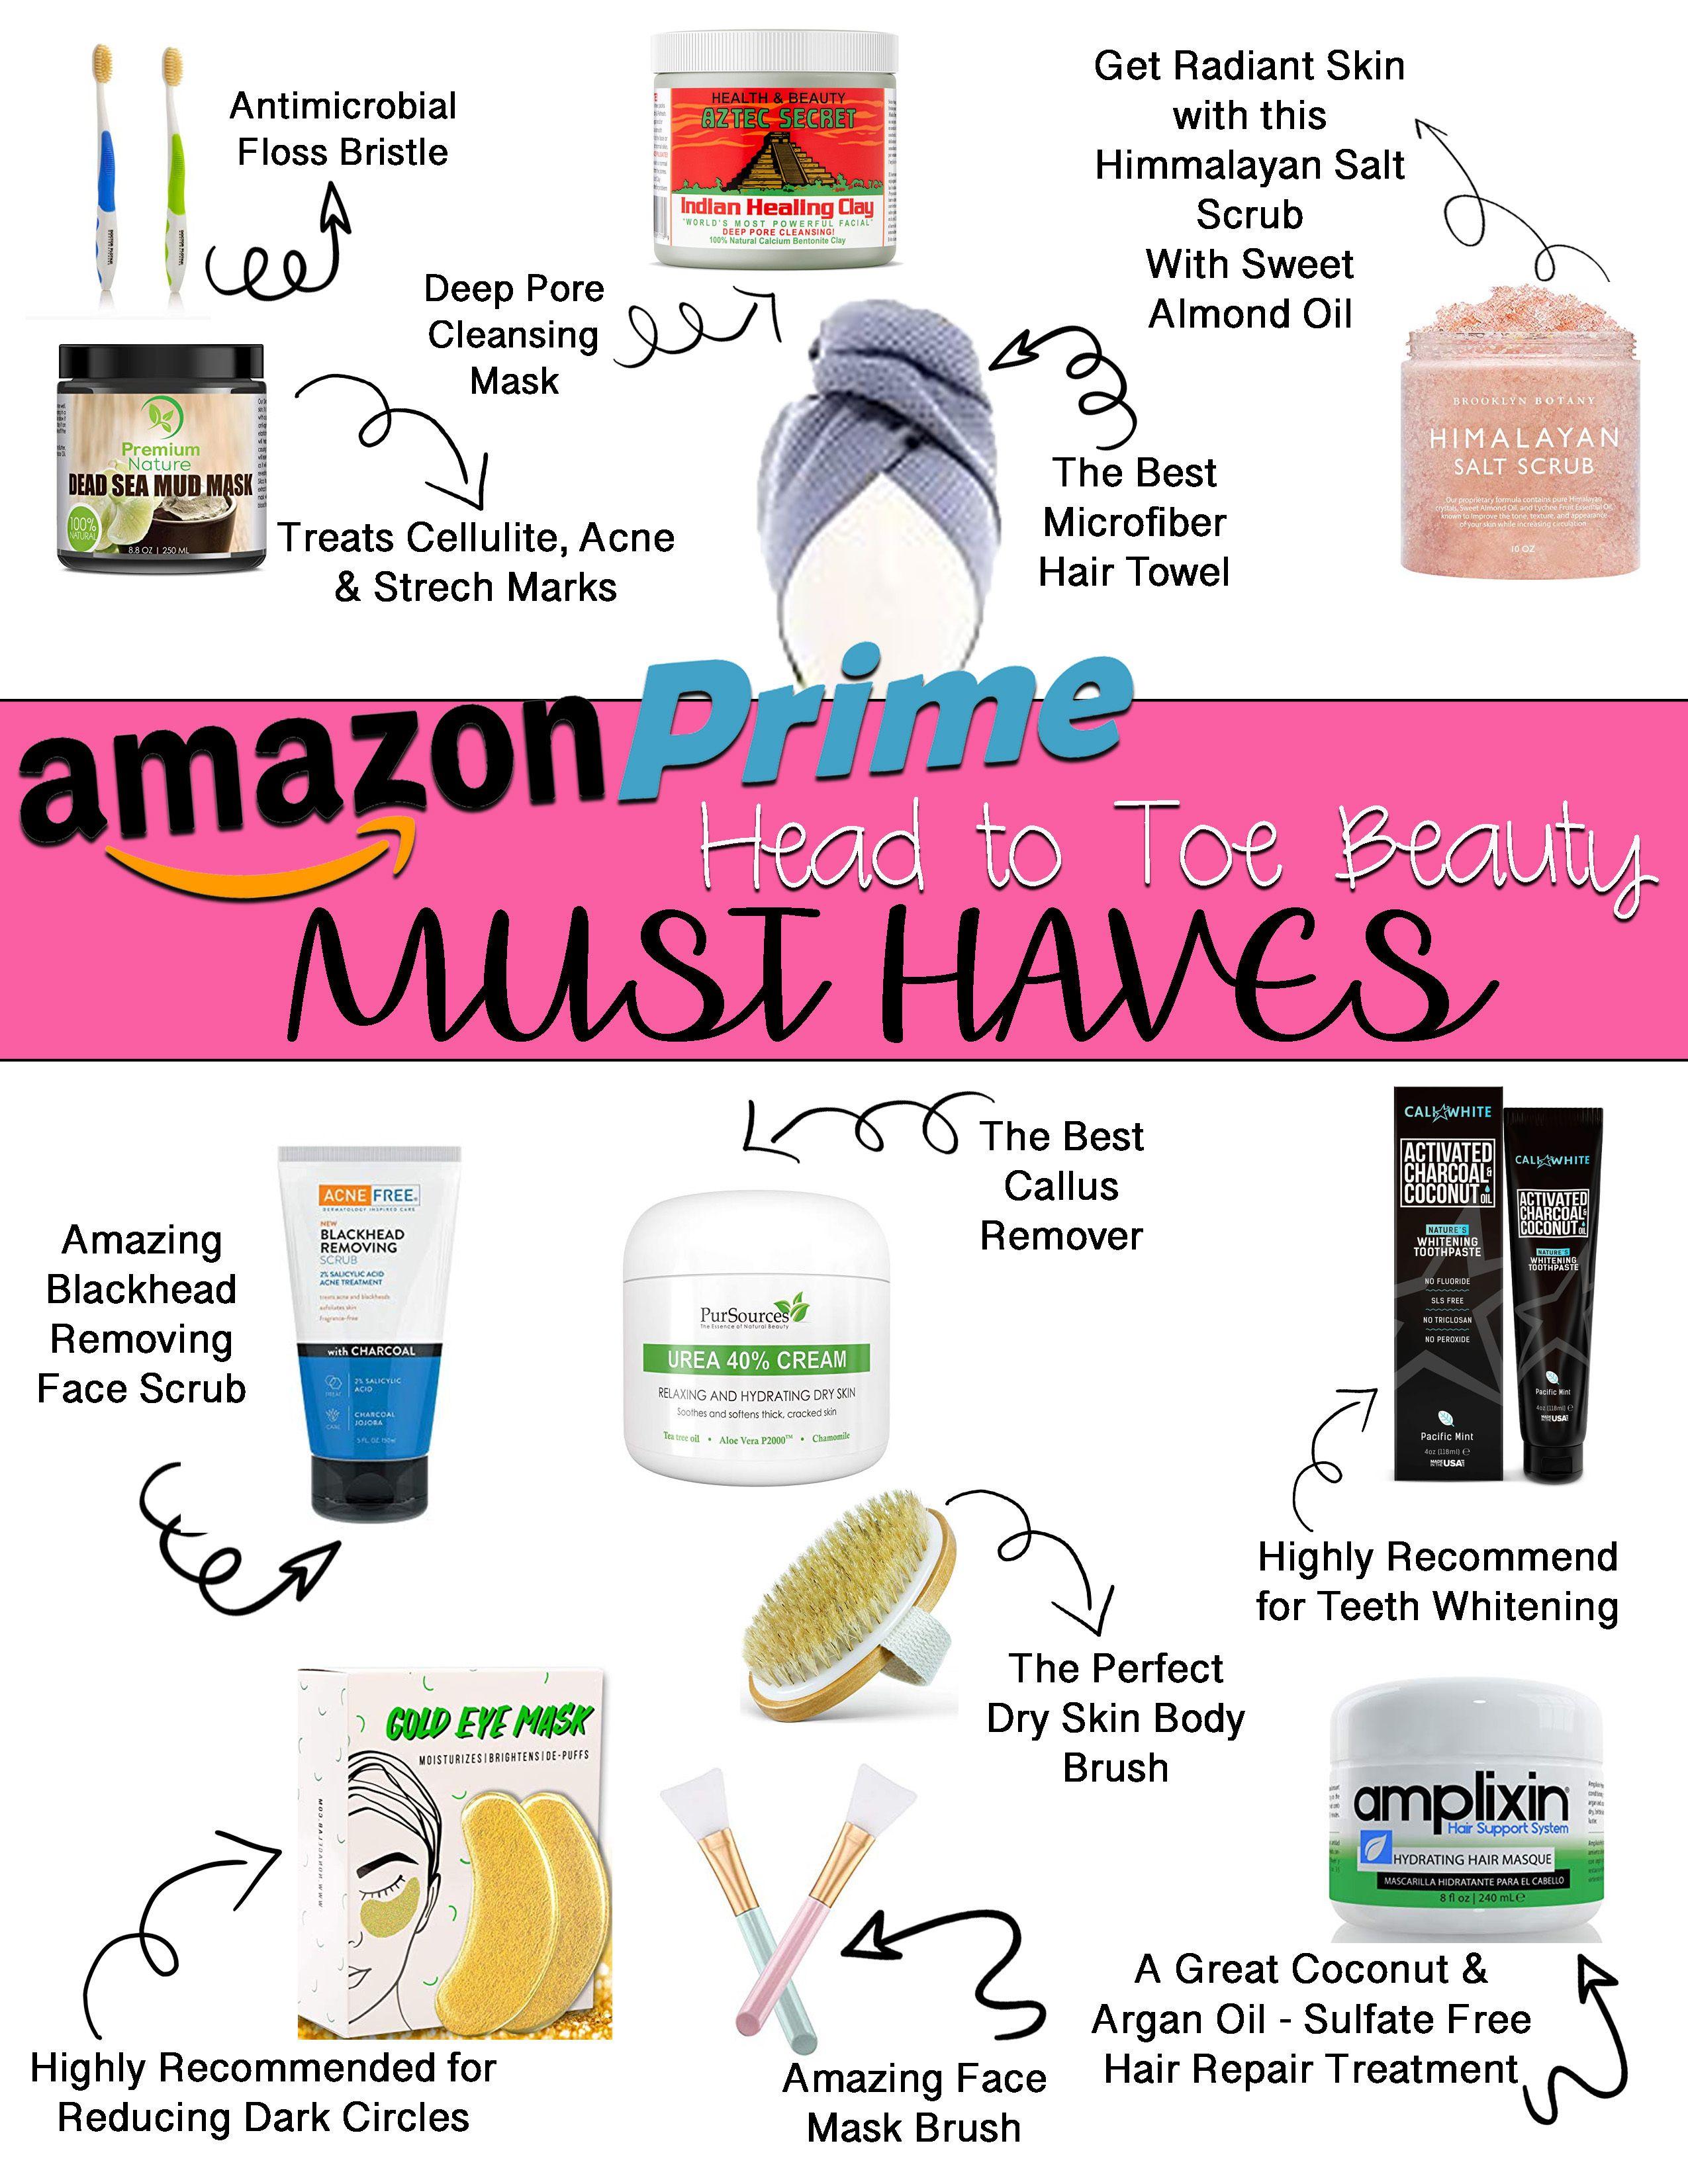 15 Must have Amazon Prime luxury beauty products Amazon